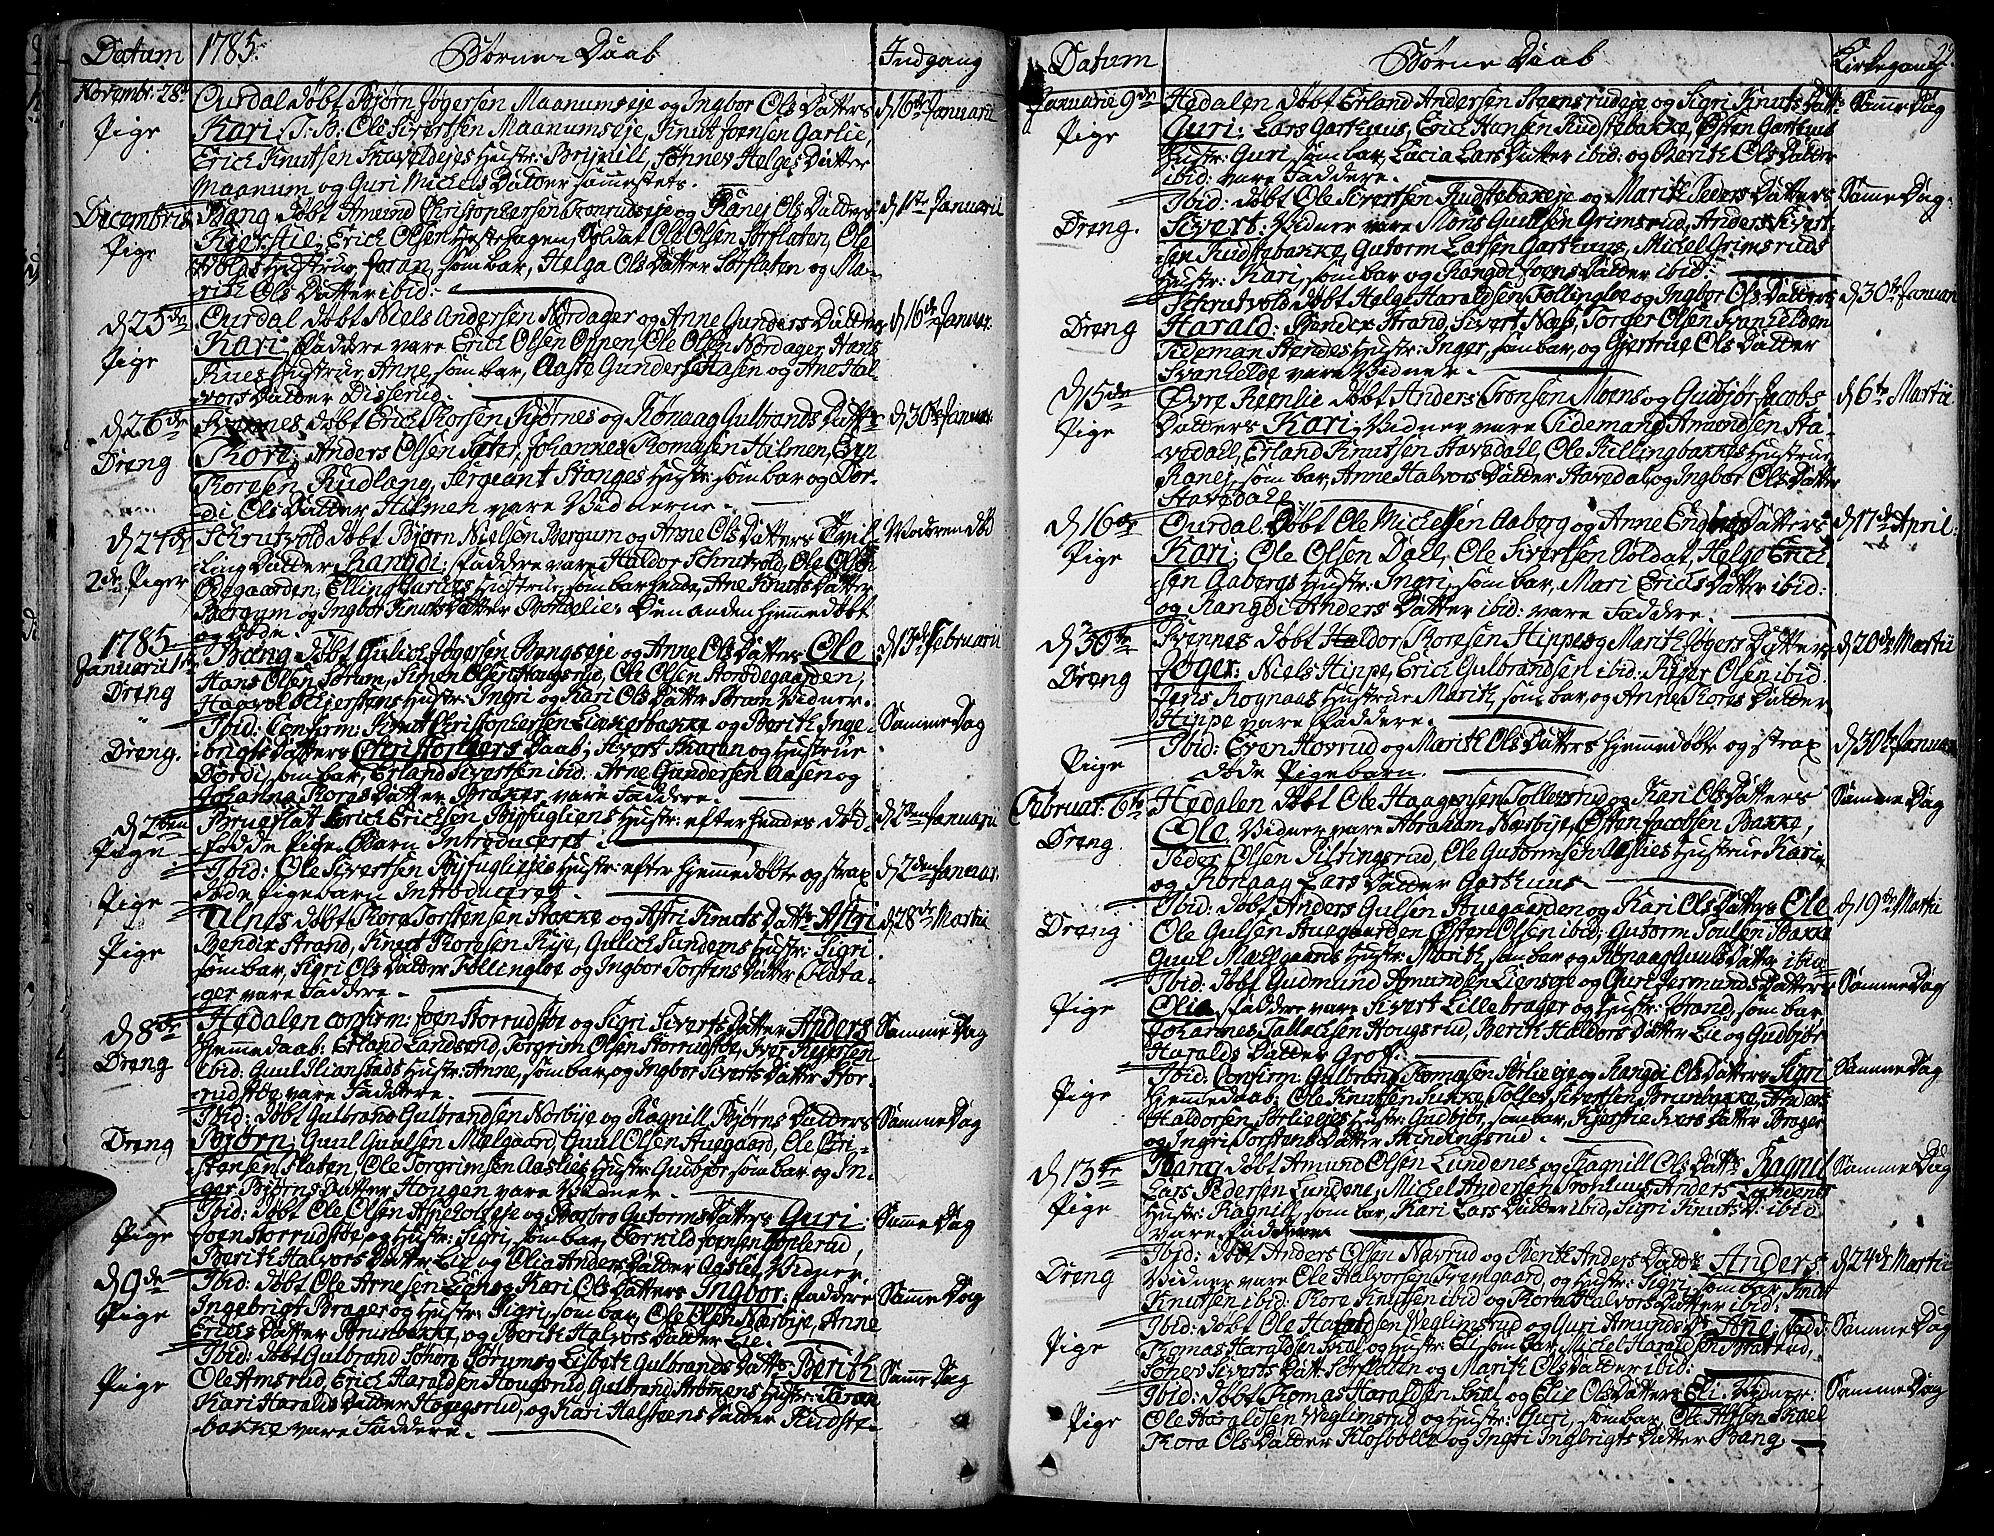 SAH, Aurdal prestekontor, Ministerialbok nr. 6, 1781-1804, s. 22